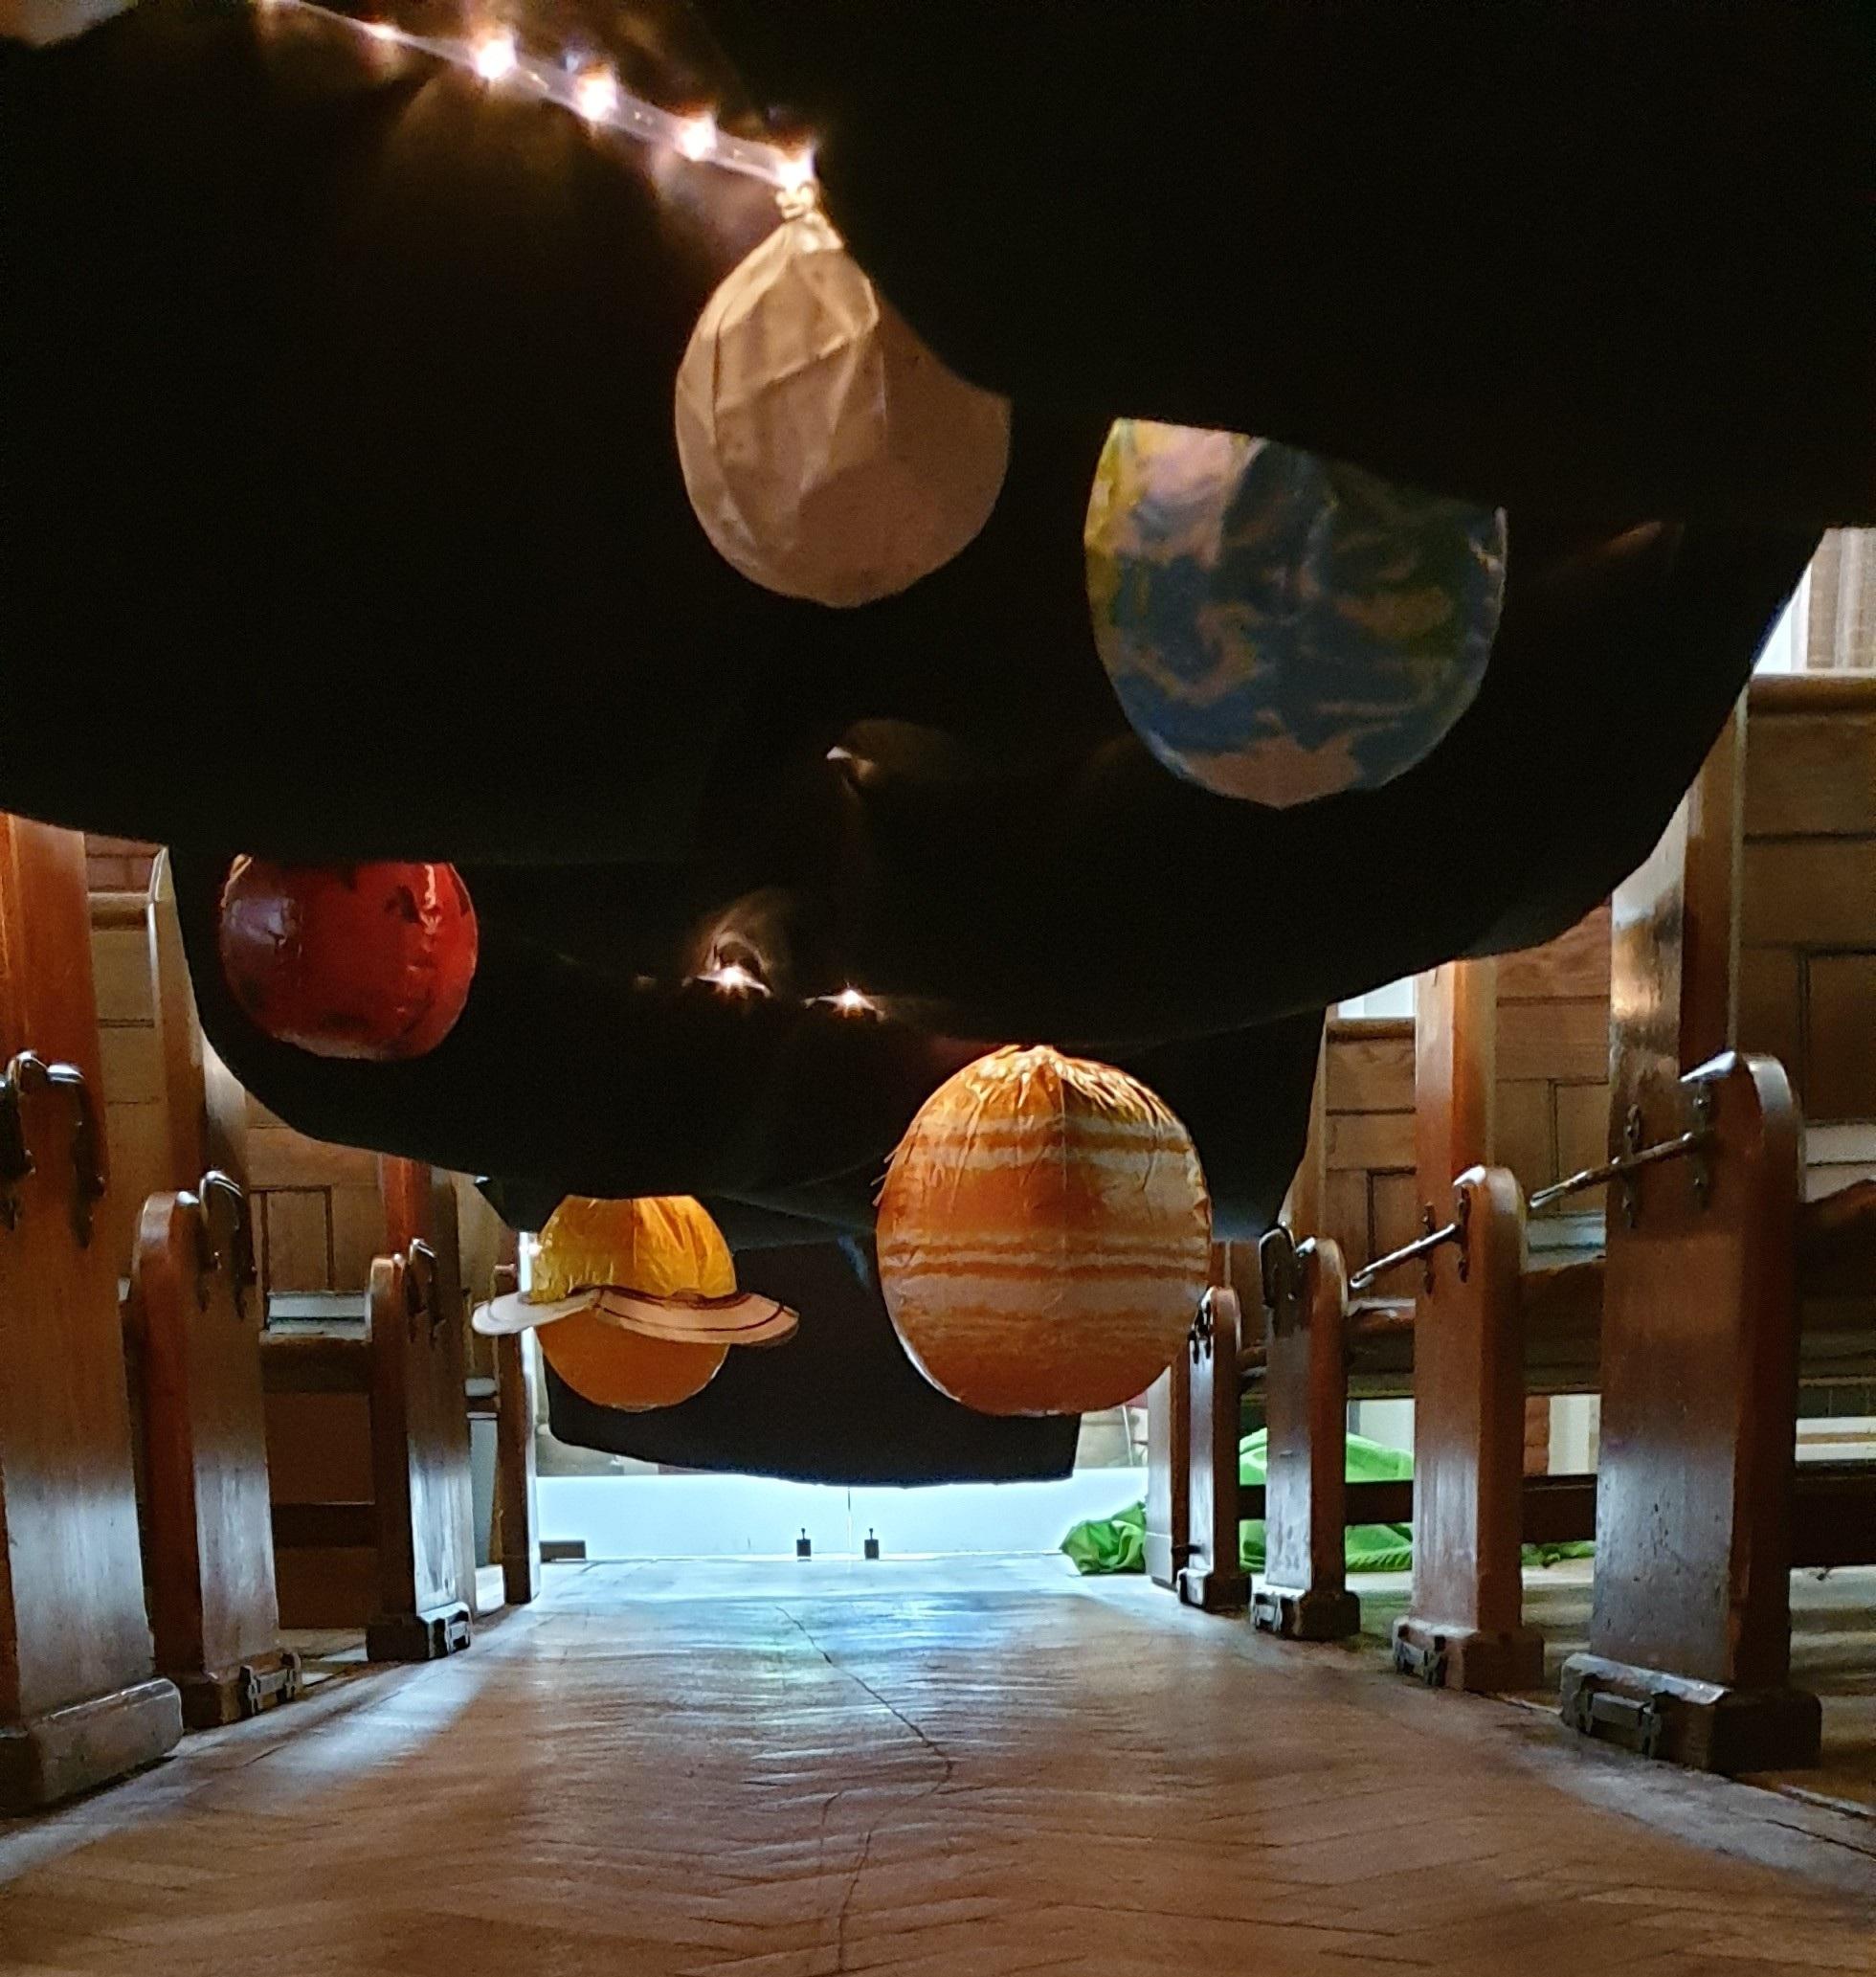 God's Creation Story (Day 4, Sun, Moon & Stars)